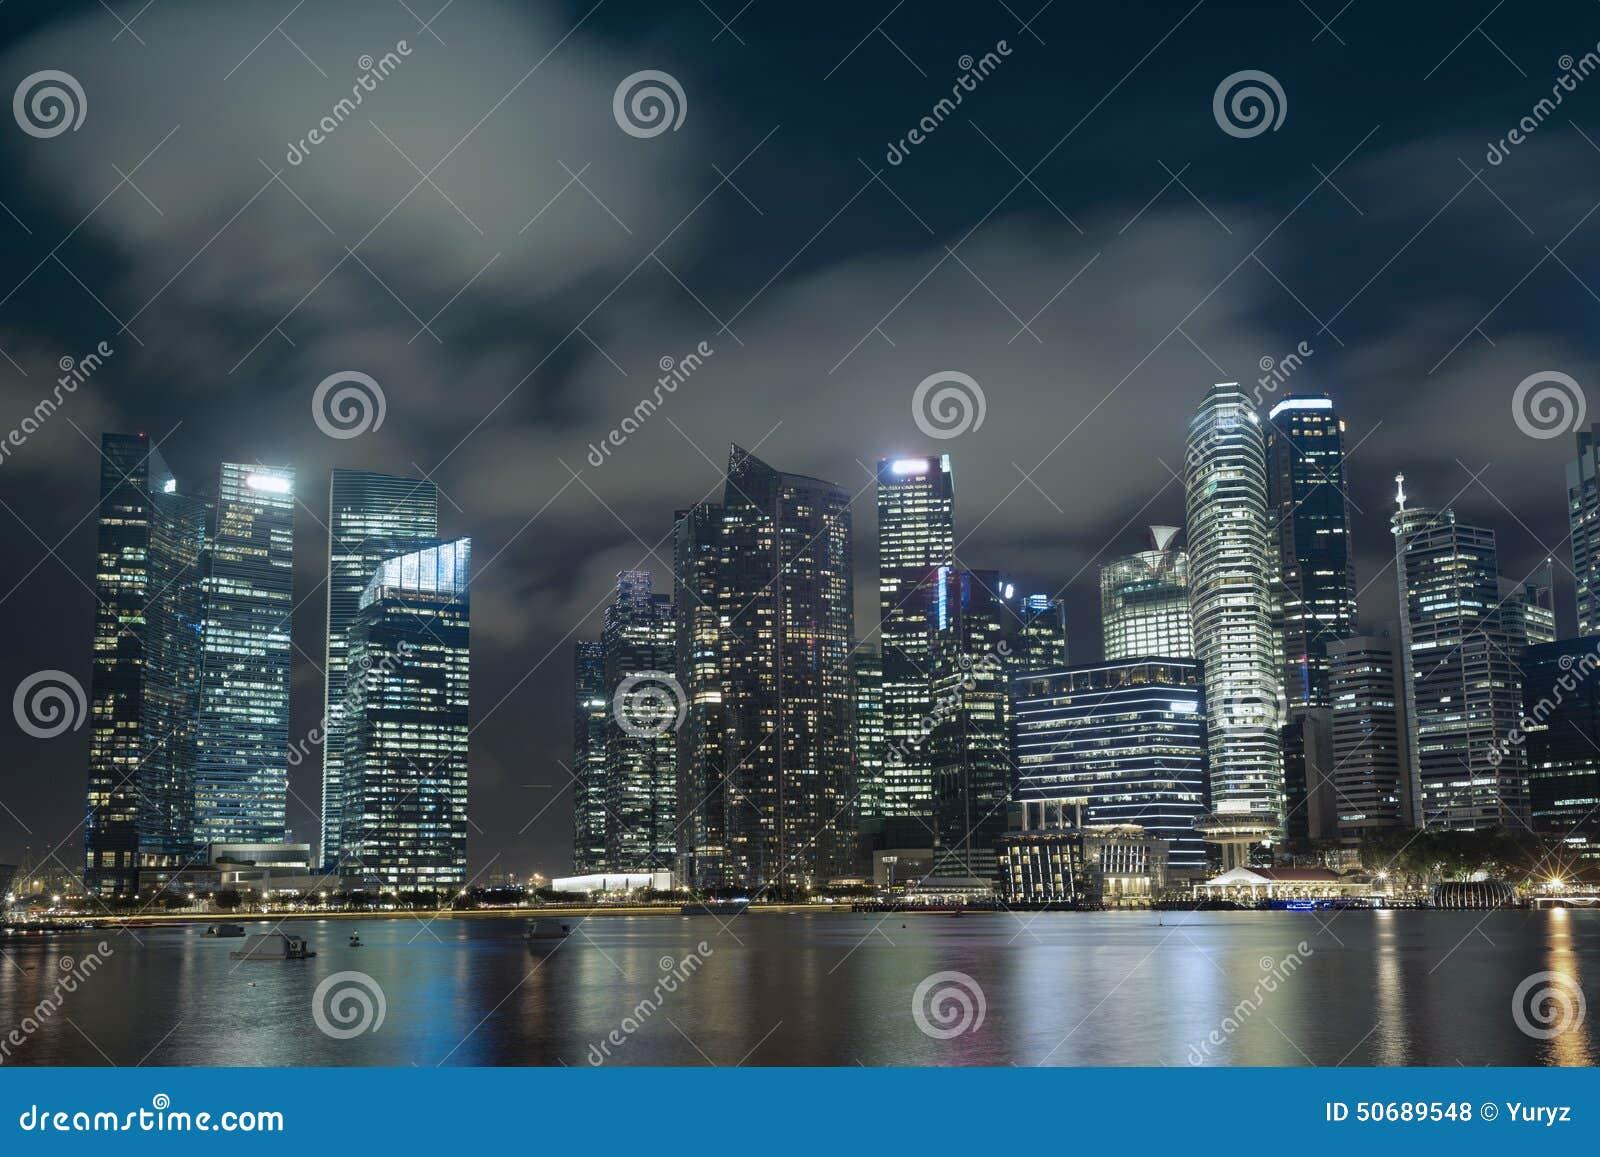 Download 新加坡地平线 库存照片. 图片 包括有 新加坡, 地平线, 都市, 街市, 反映, 都市风景, 现代, 摩天大楼 - 50689548